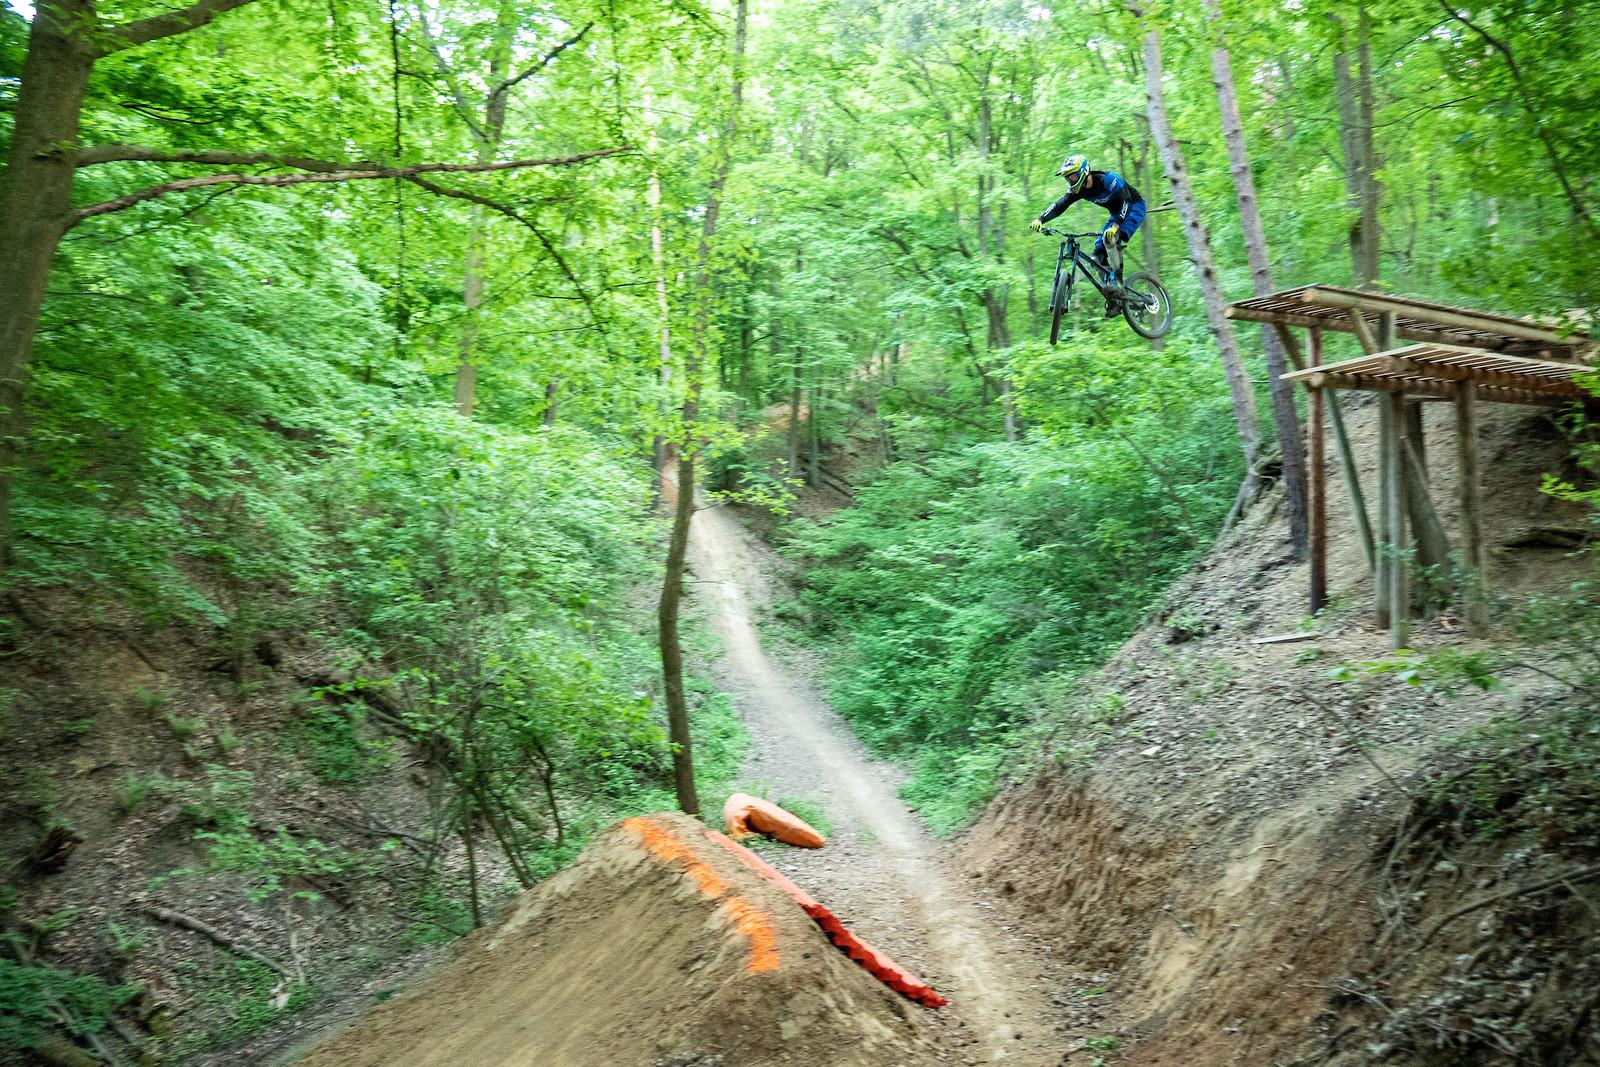 Kalnica big drop - maltrovsky - Mountain Biking Pictures - Vital MTB